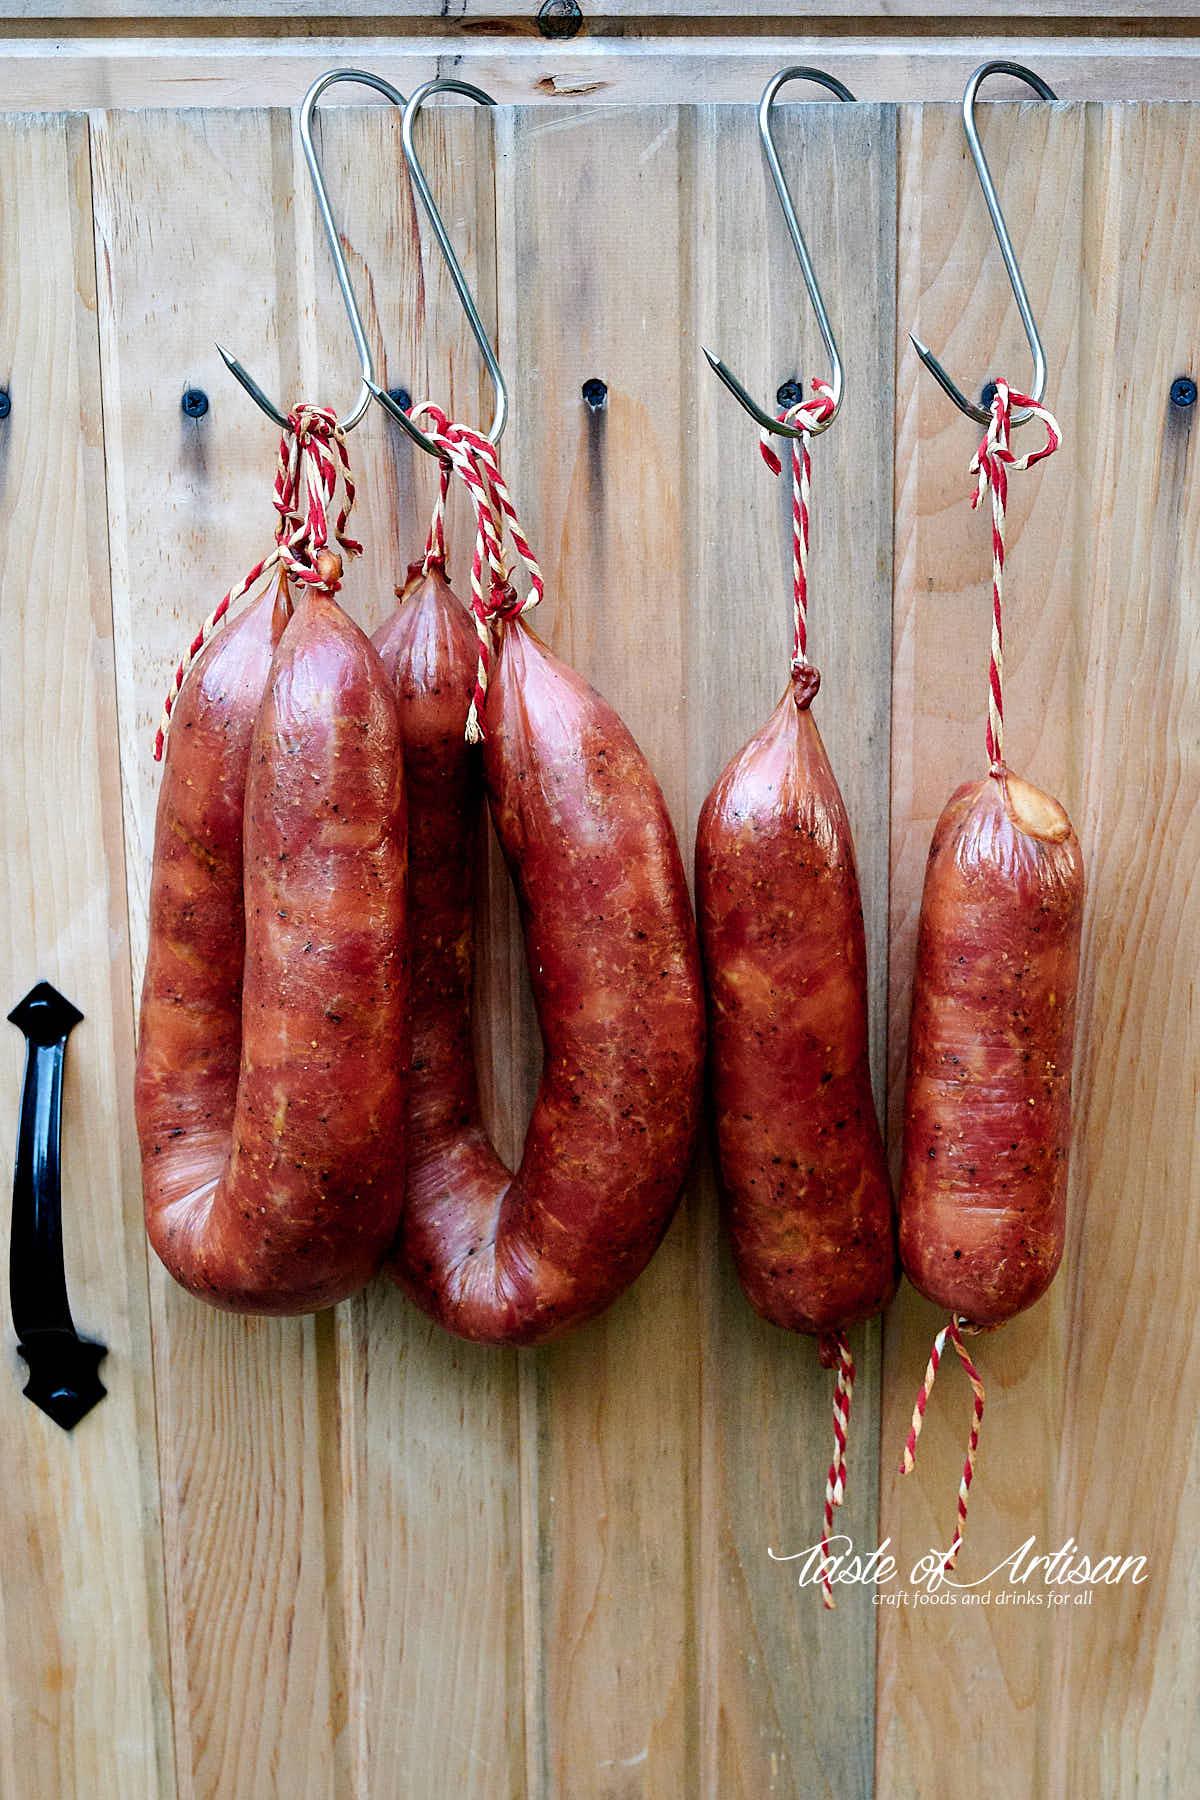 Smoked kielbasa rings hanging on the door of a smokehouse.